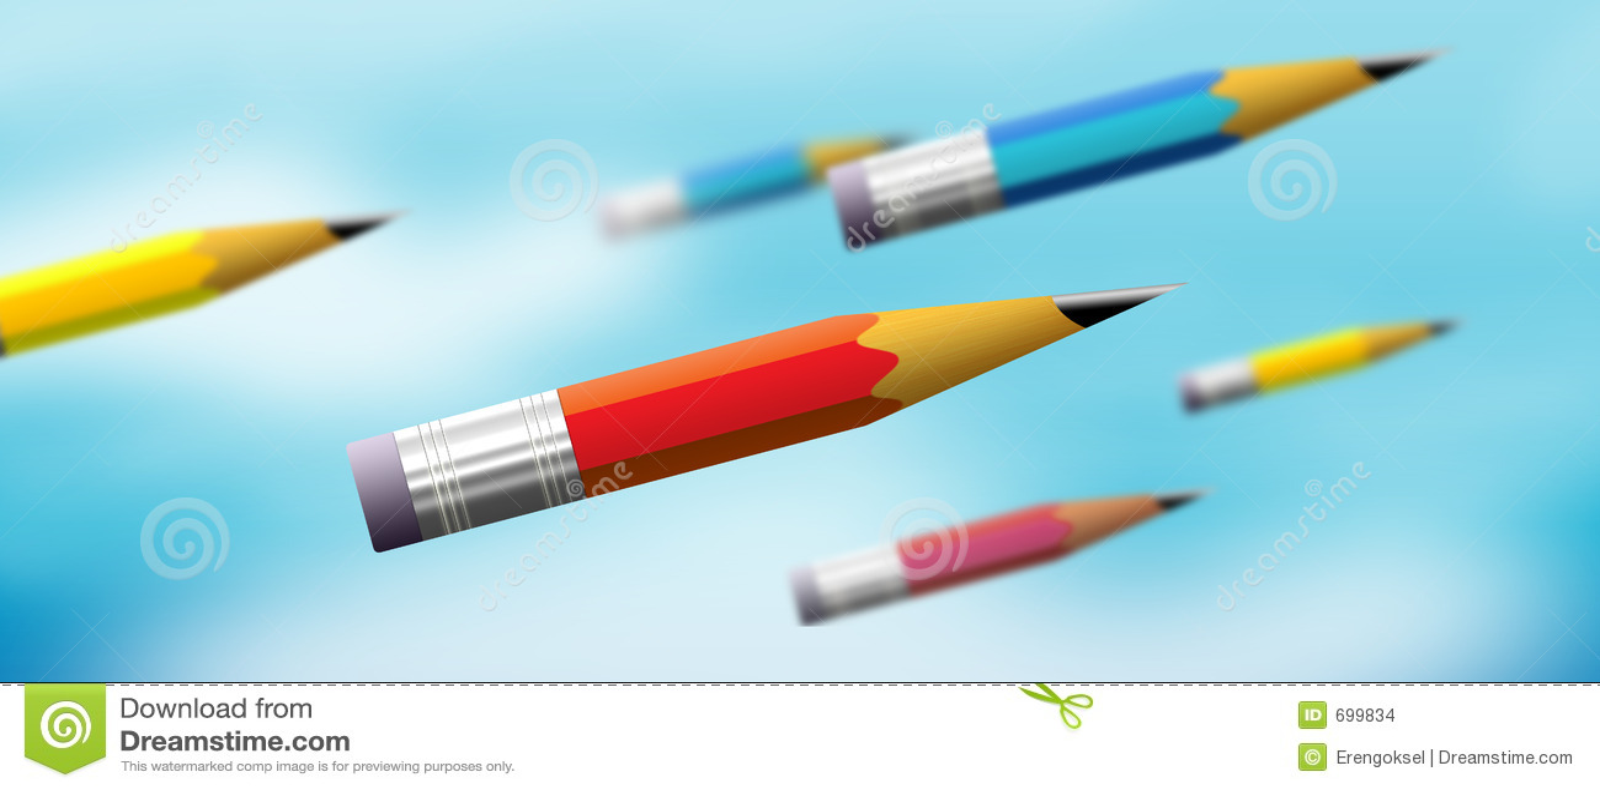 Potência do lápis